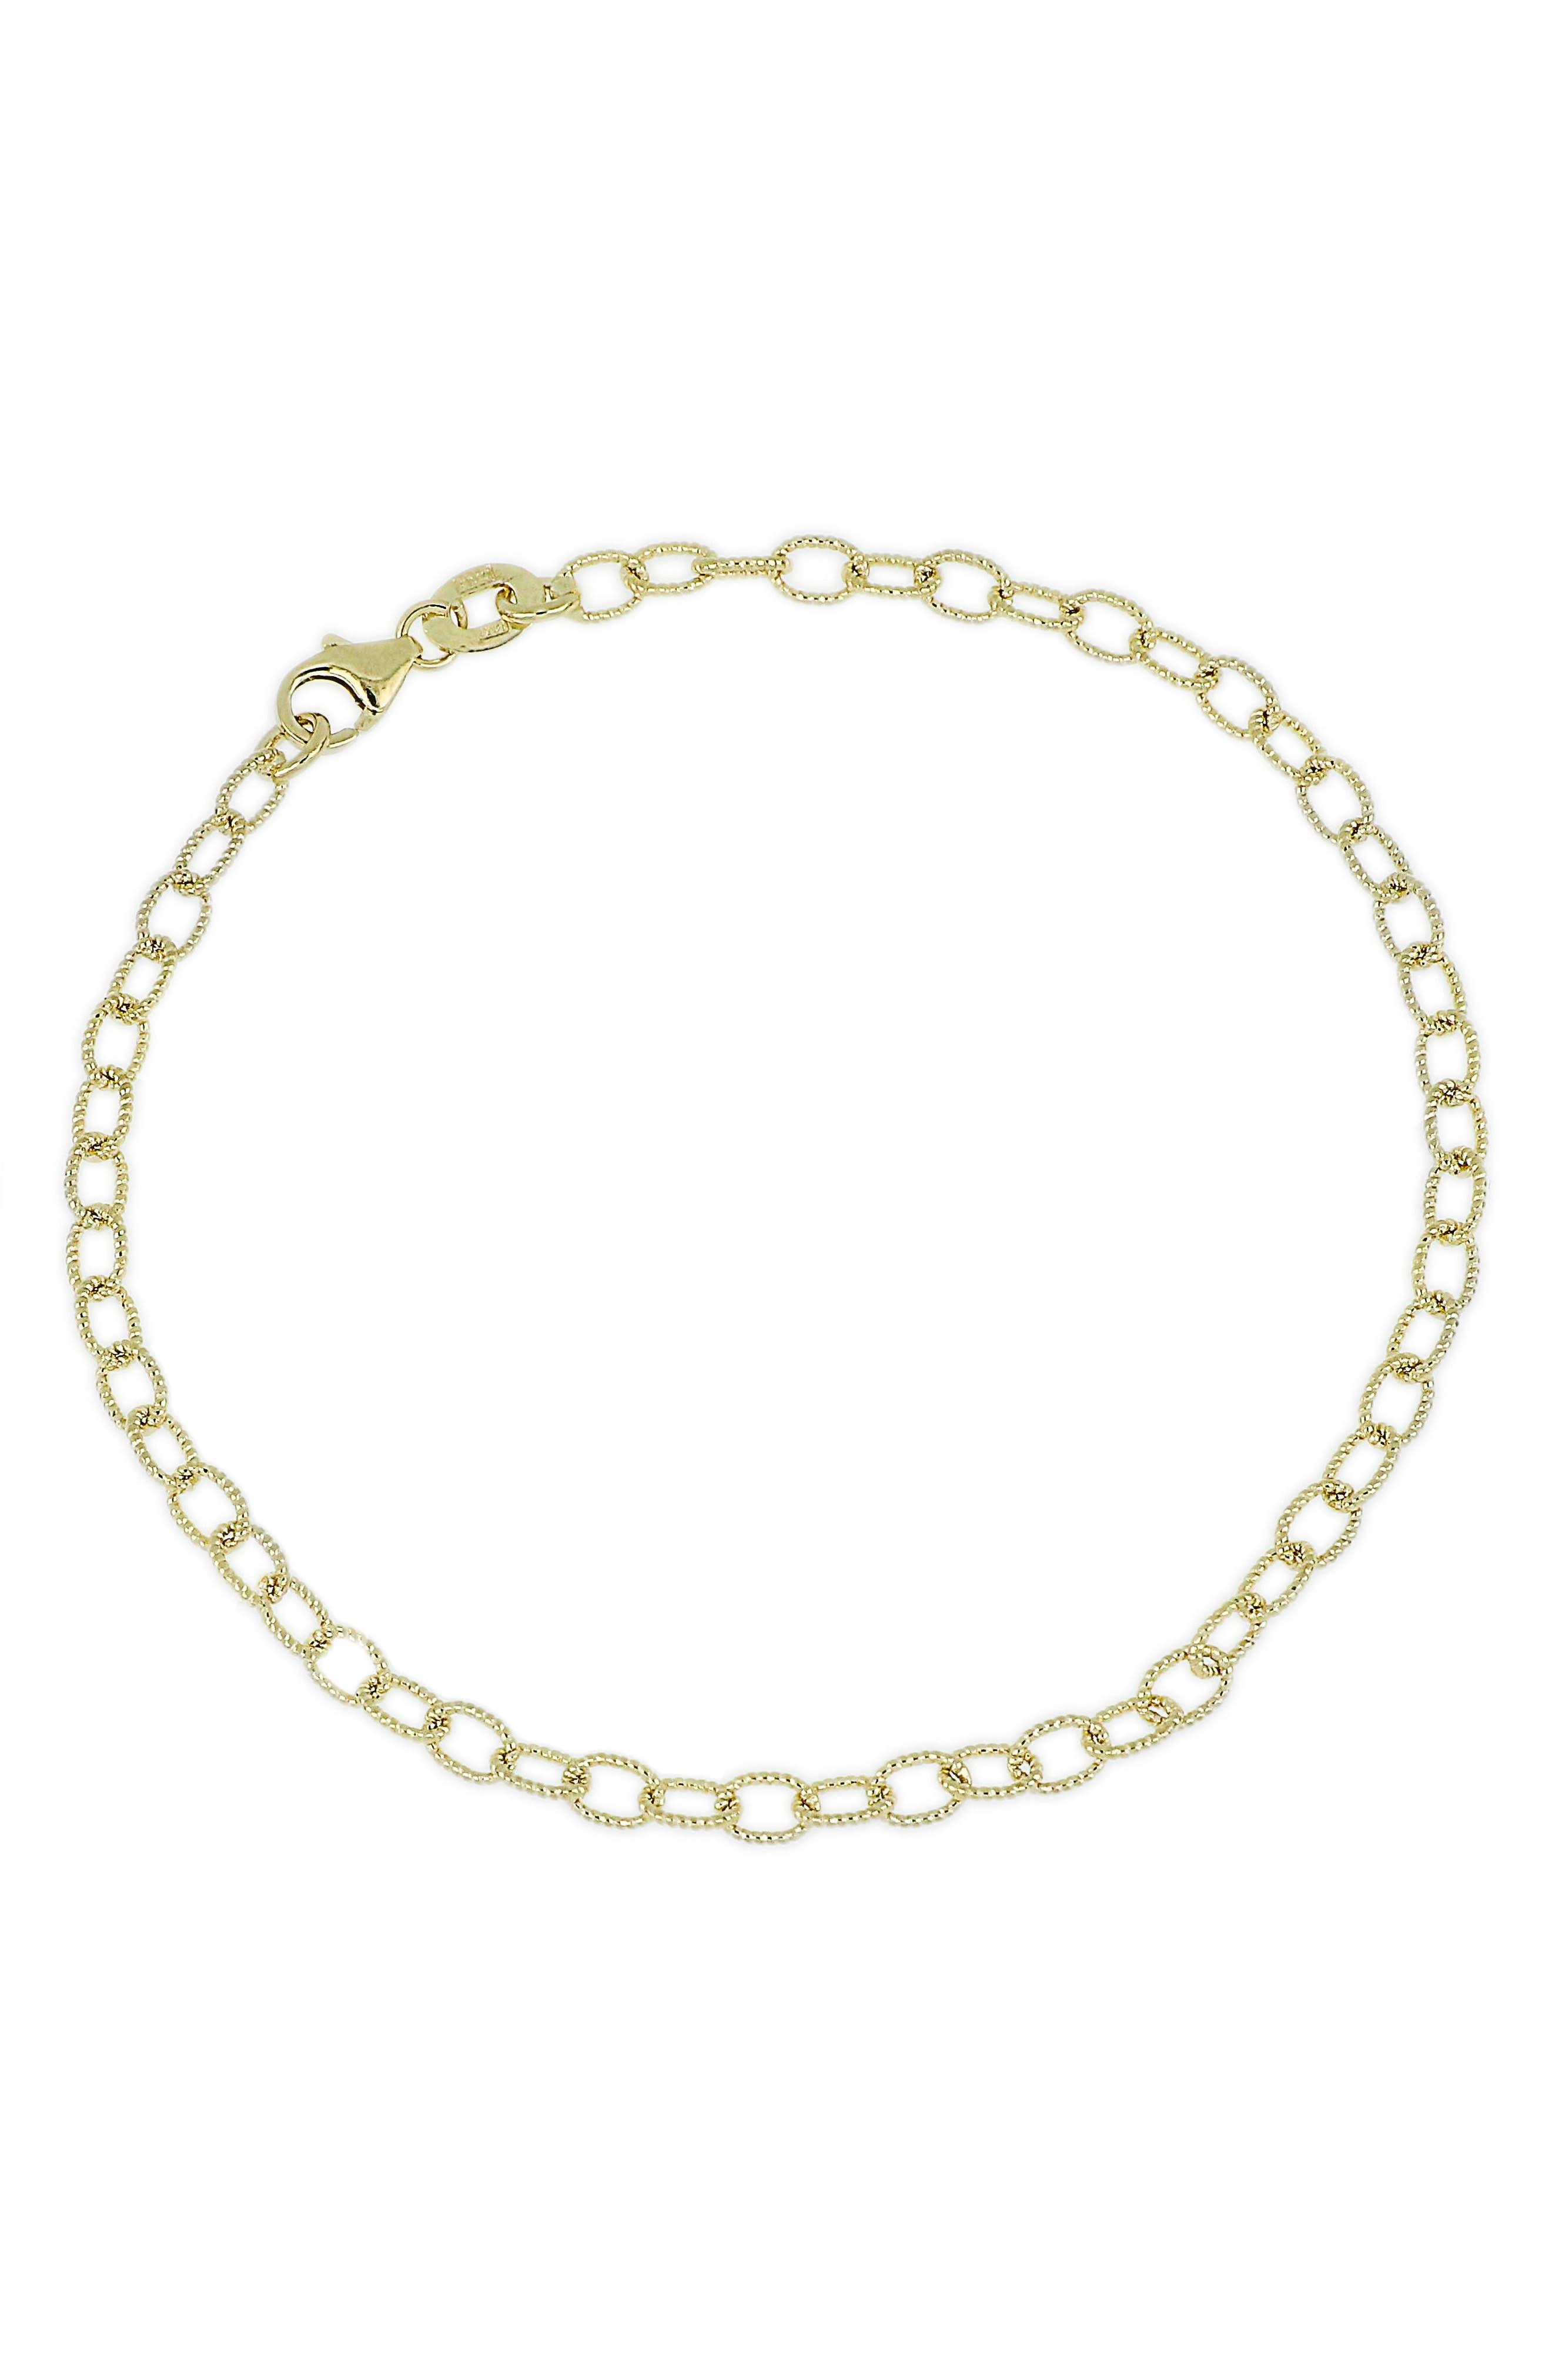 14k Gold Link Charm Bracelet,                             Main thumbnail 1, color,                             Yellow Gold